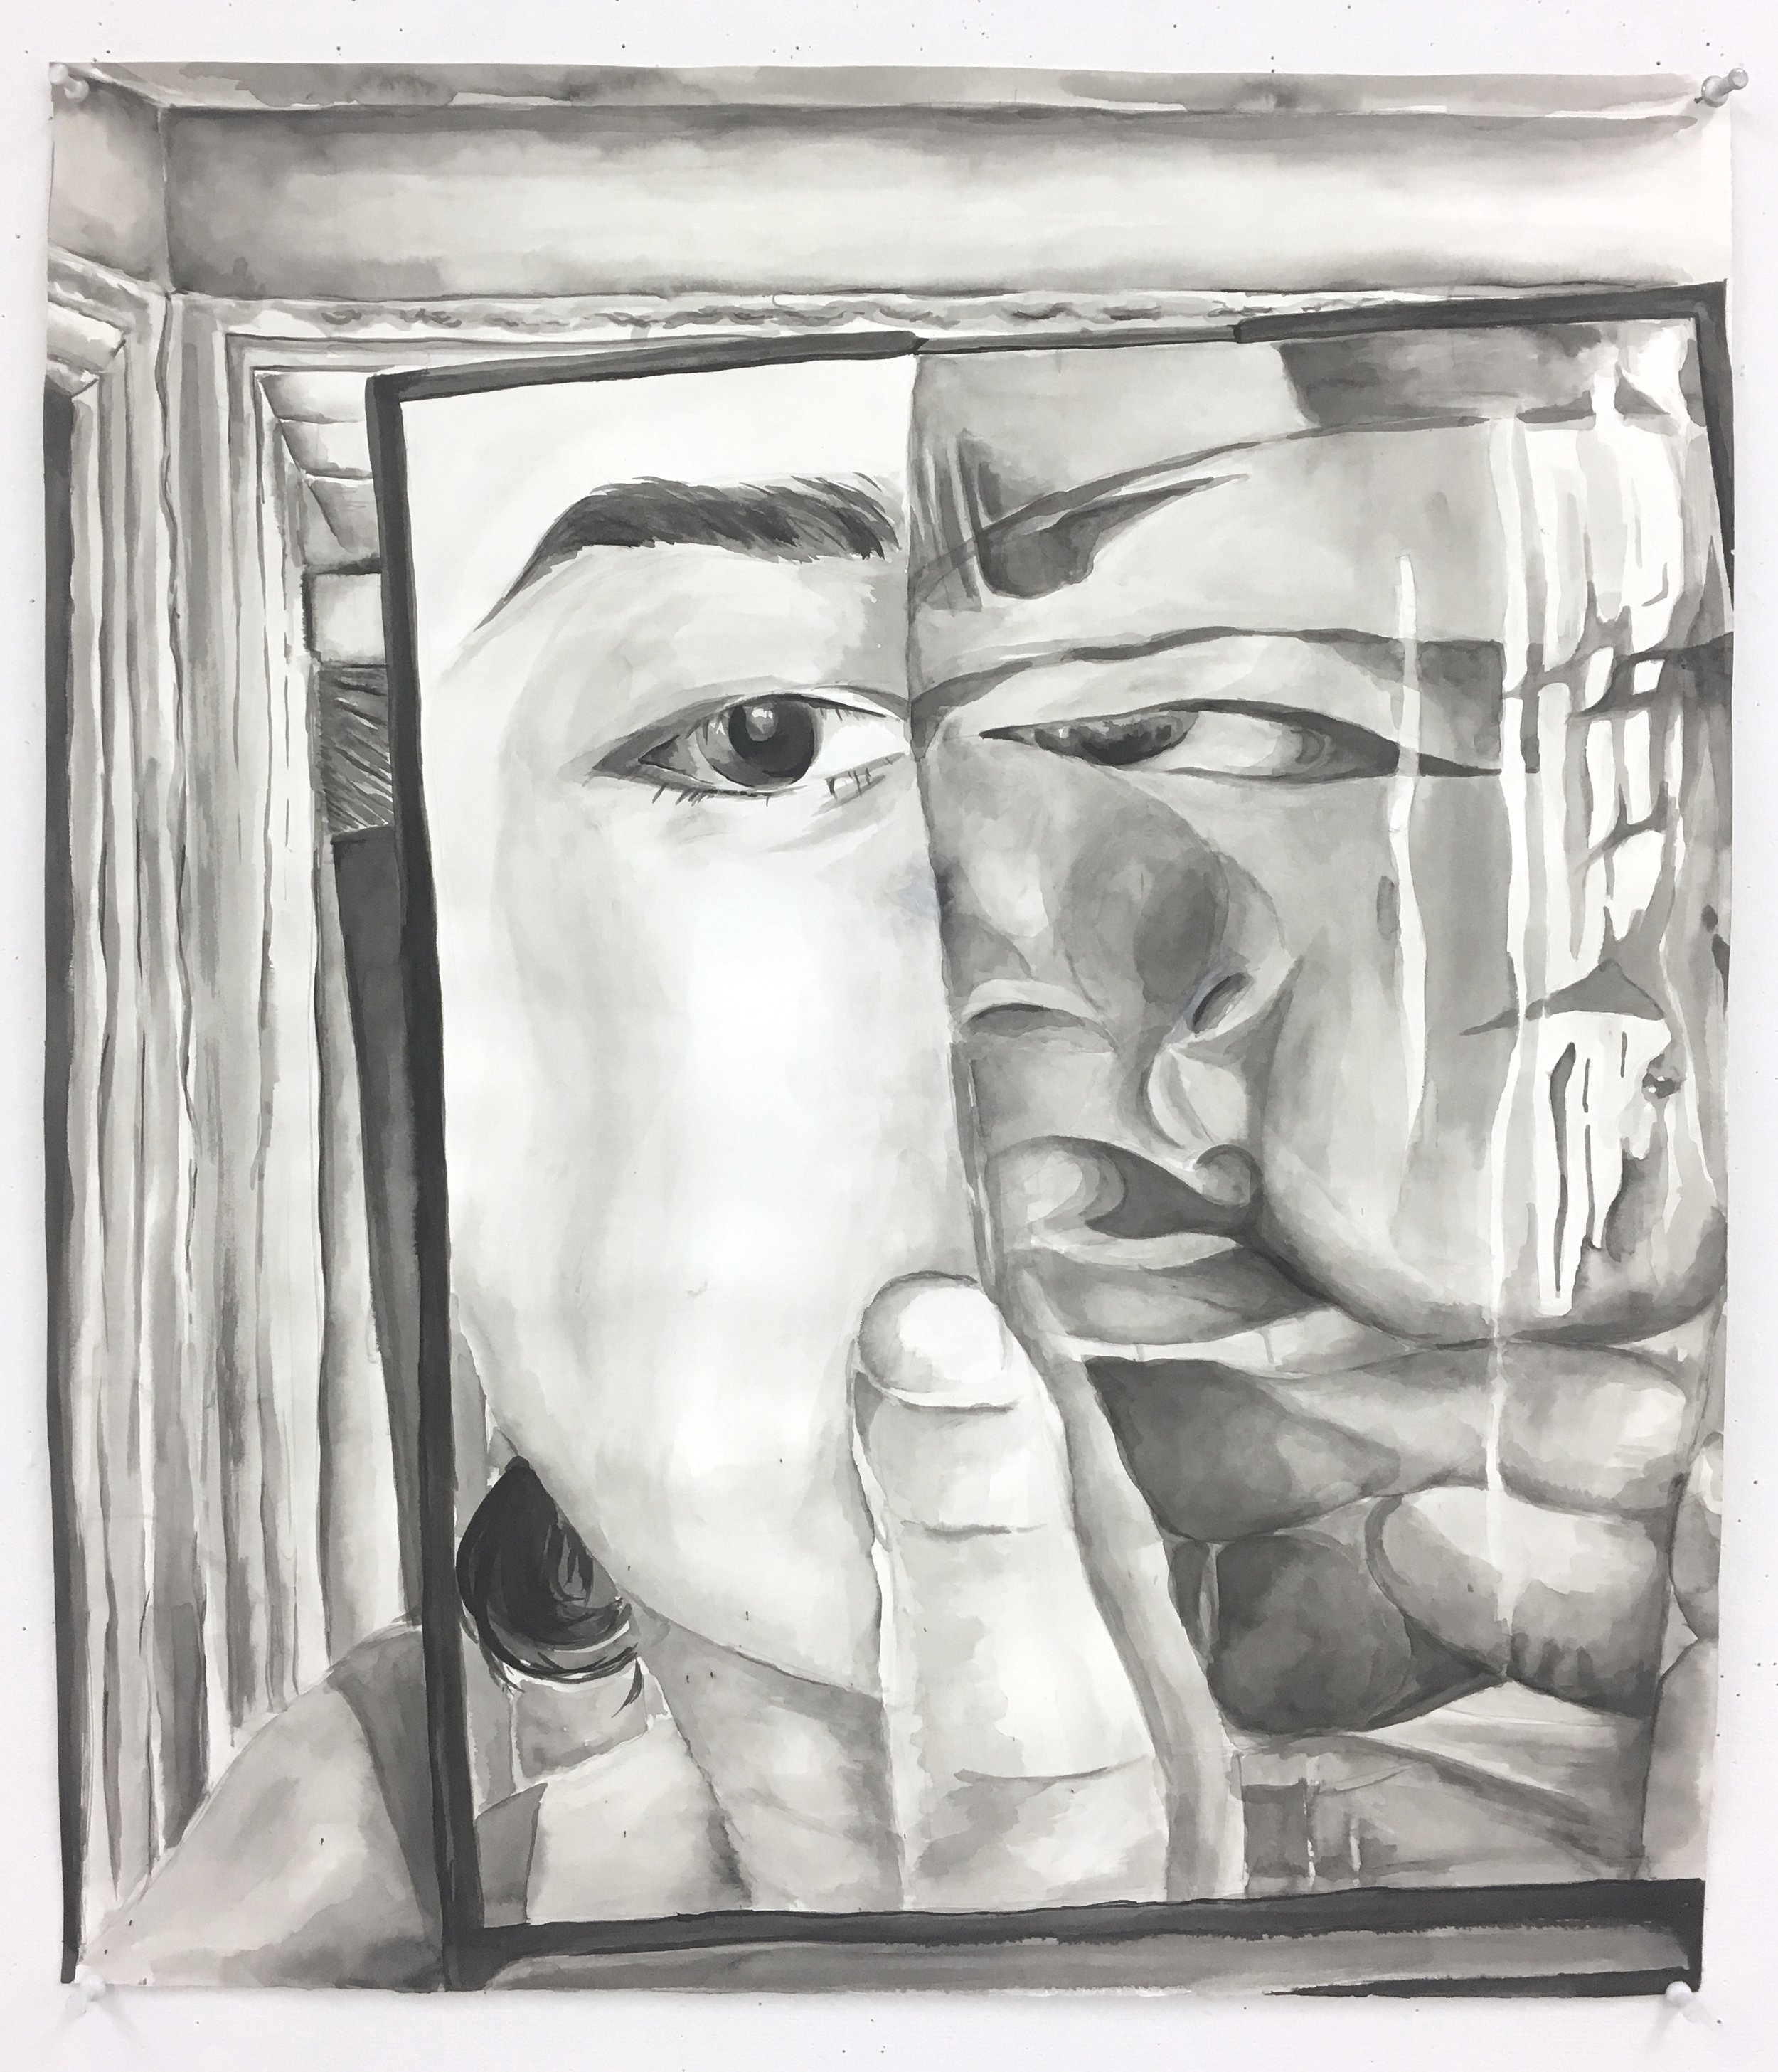 Chanry Shuai,  Self-Portait in Glass